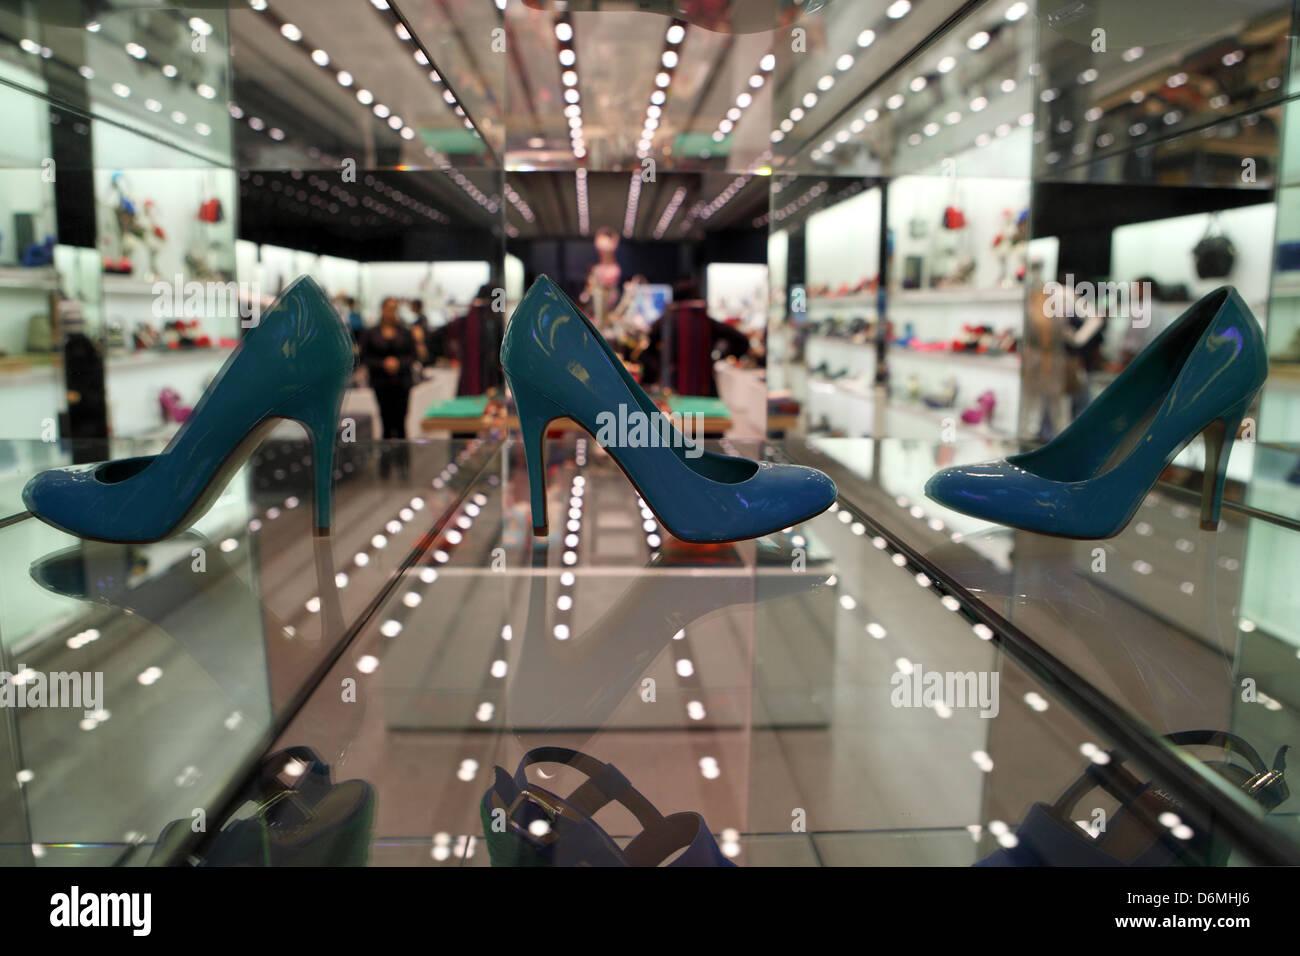 bde0356b4 Dubai, United Arab Emirates, Women's shoes in a shop window Stock ...